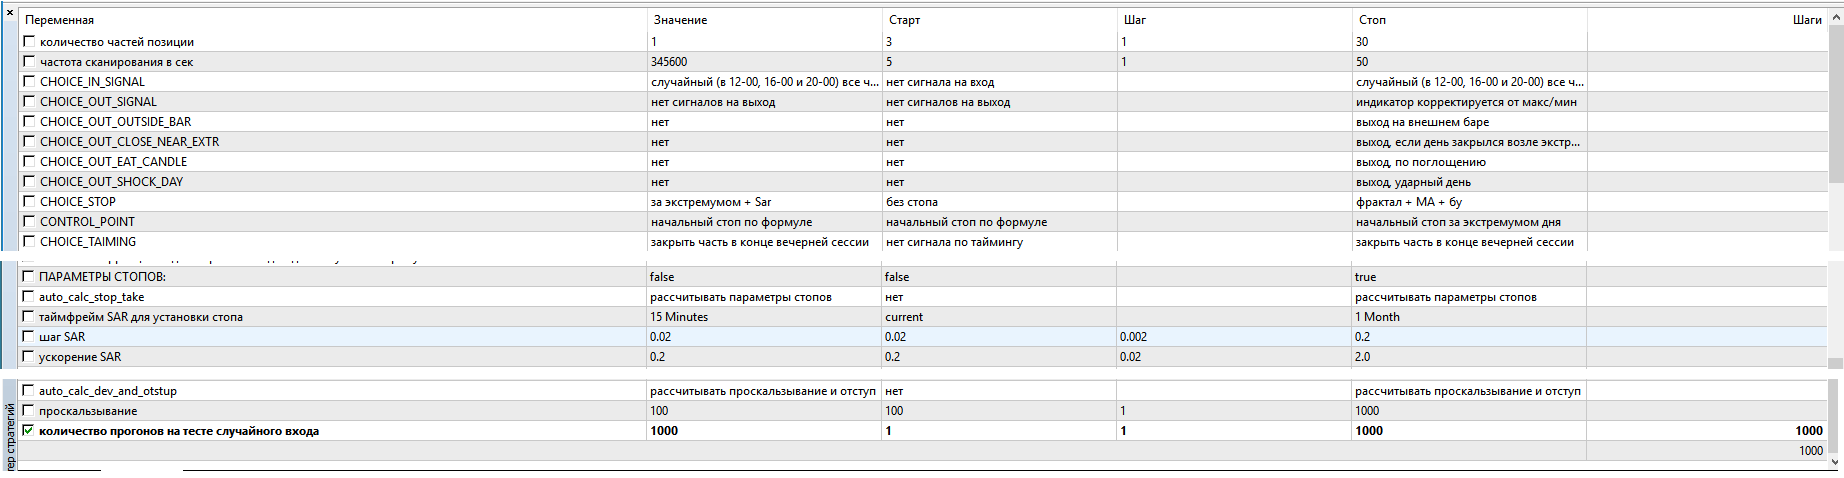 Настройка параметров для теста трейлинг стопа на основе индикатора параболик